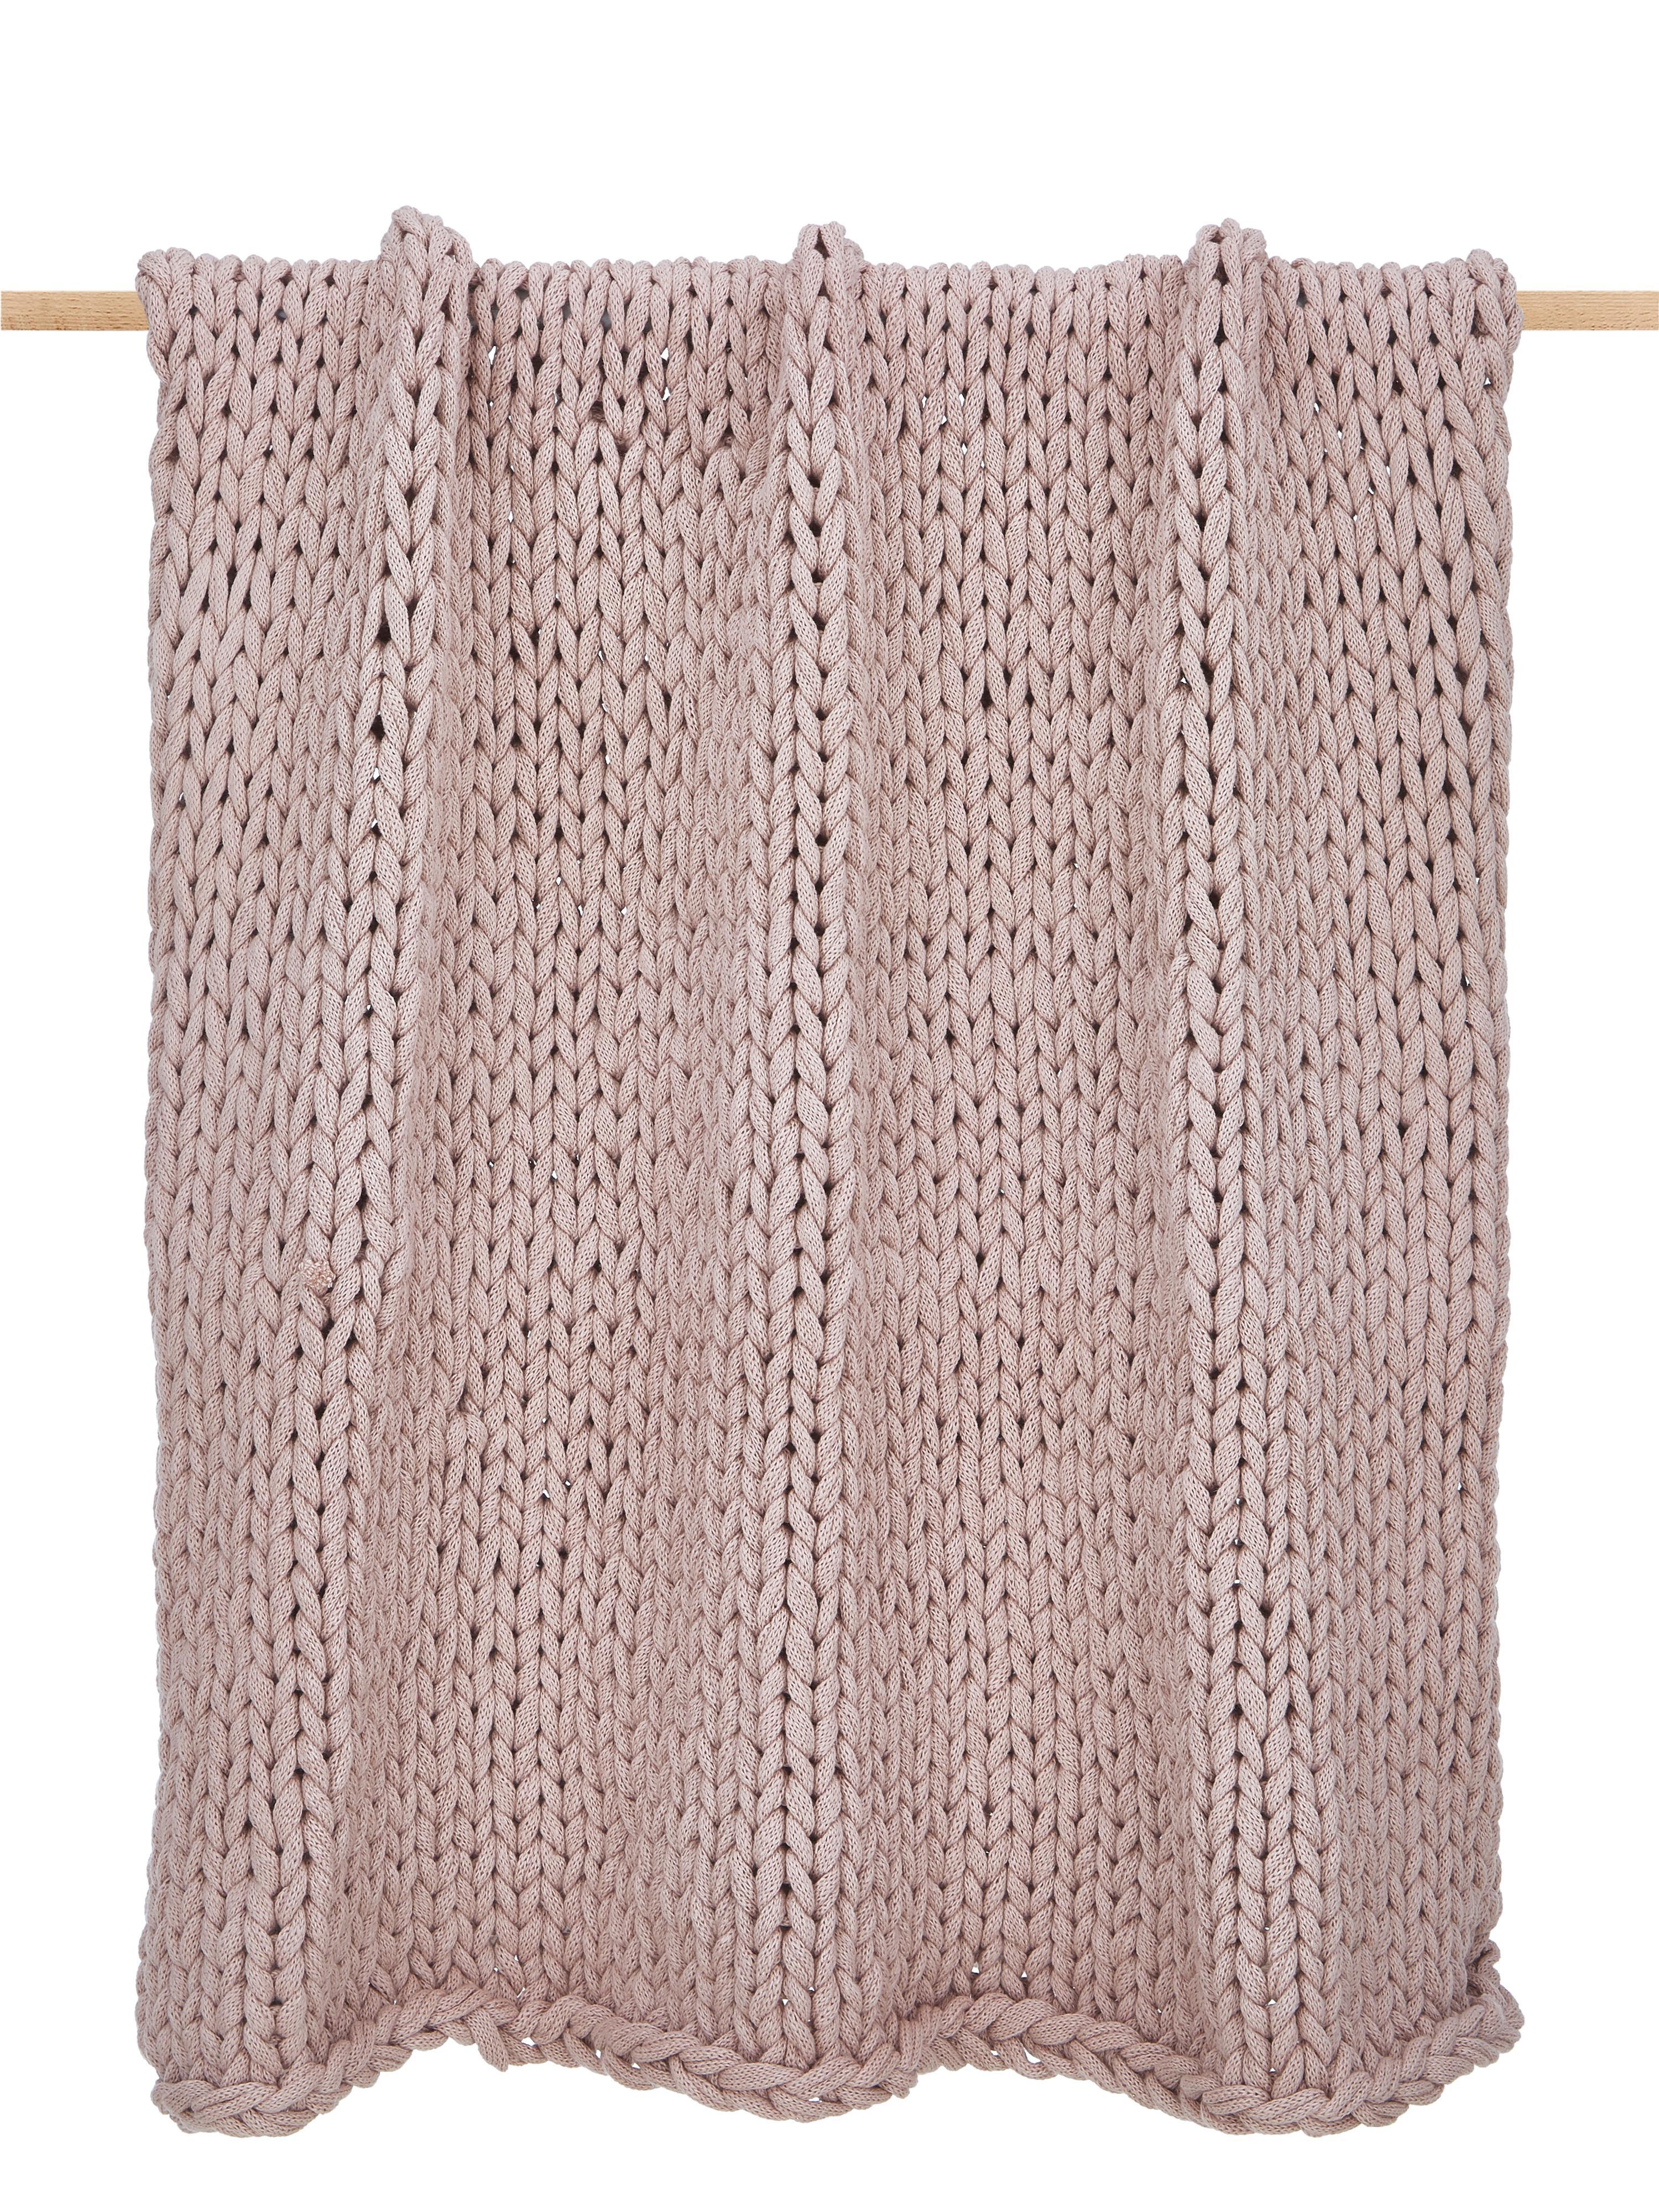 Manta de punto grueso Adyna, 100%poliacrílico, Rosa palo, An 130 x L 170 cm